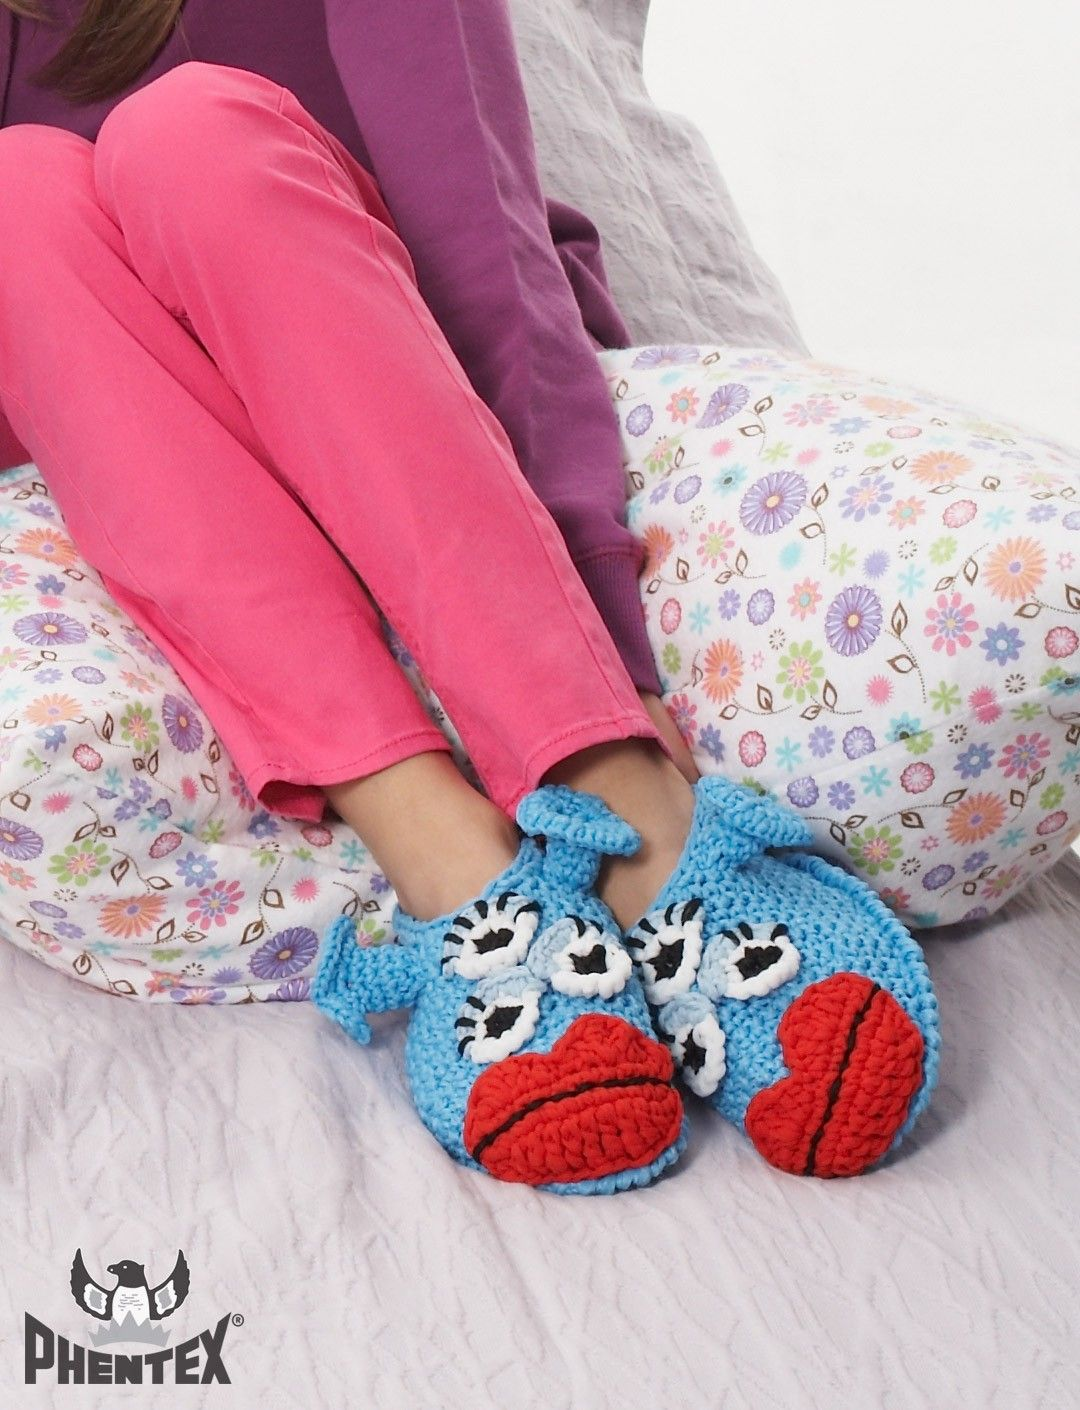 Blue Meanie Monster Slippers - Free Crochet Pattern ...